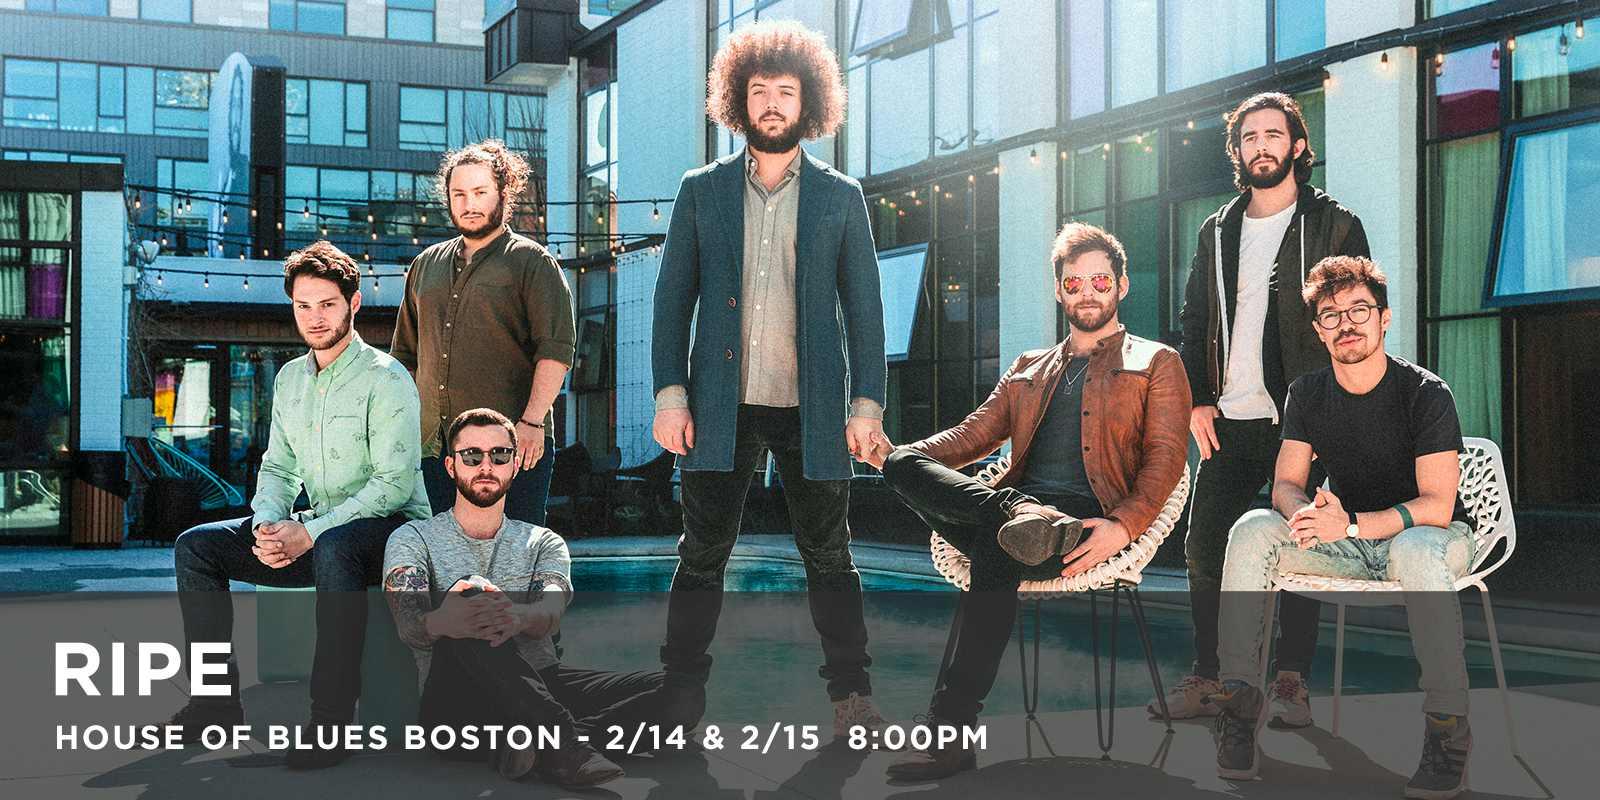 House of Blues Boston Ripe